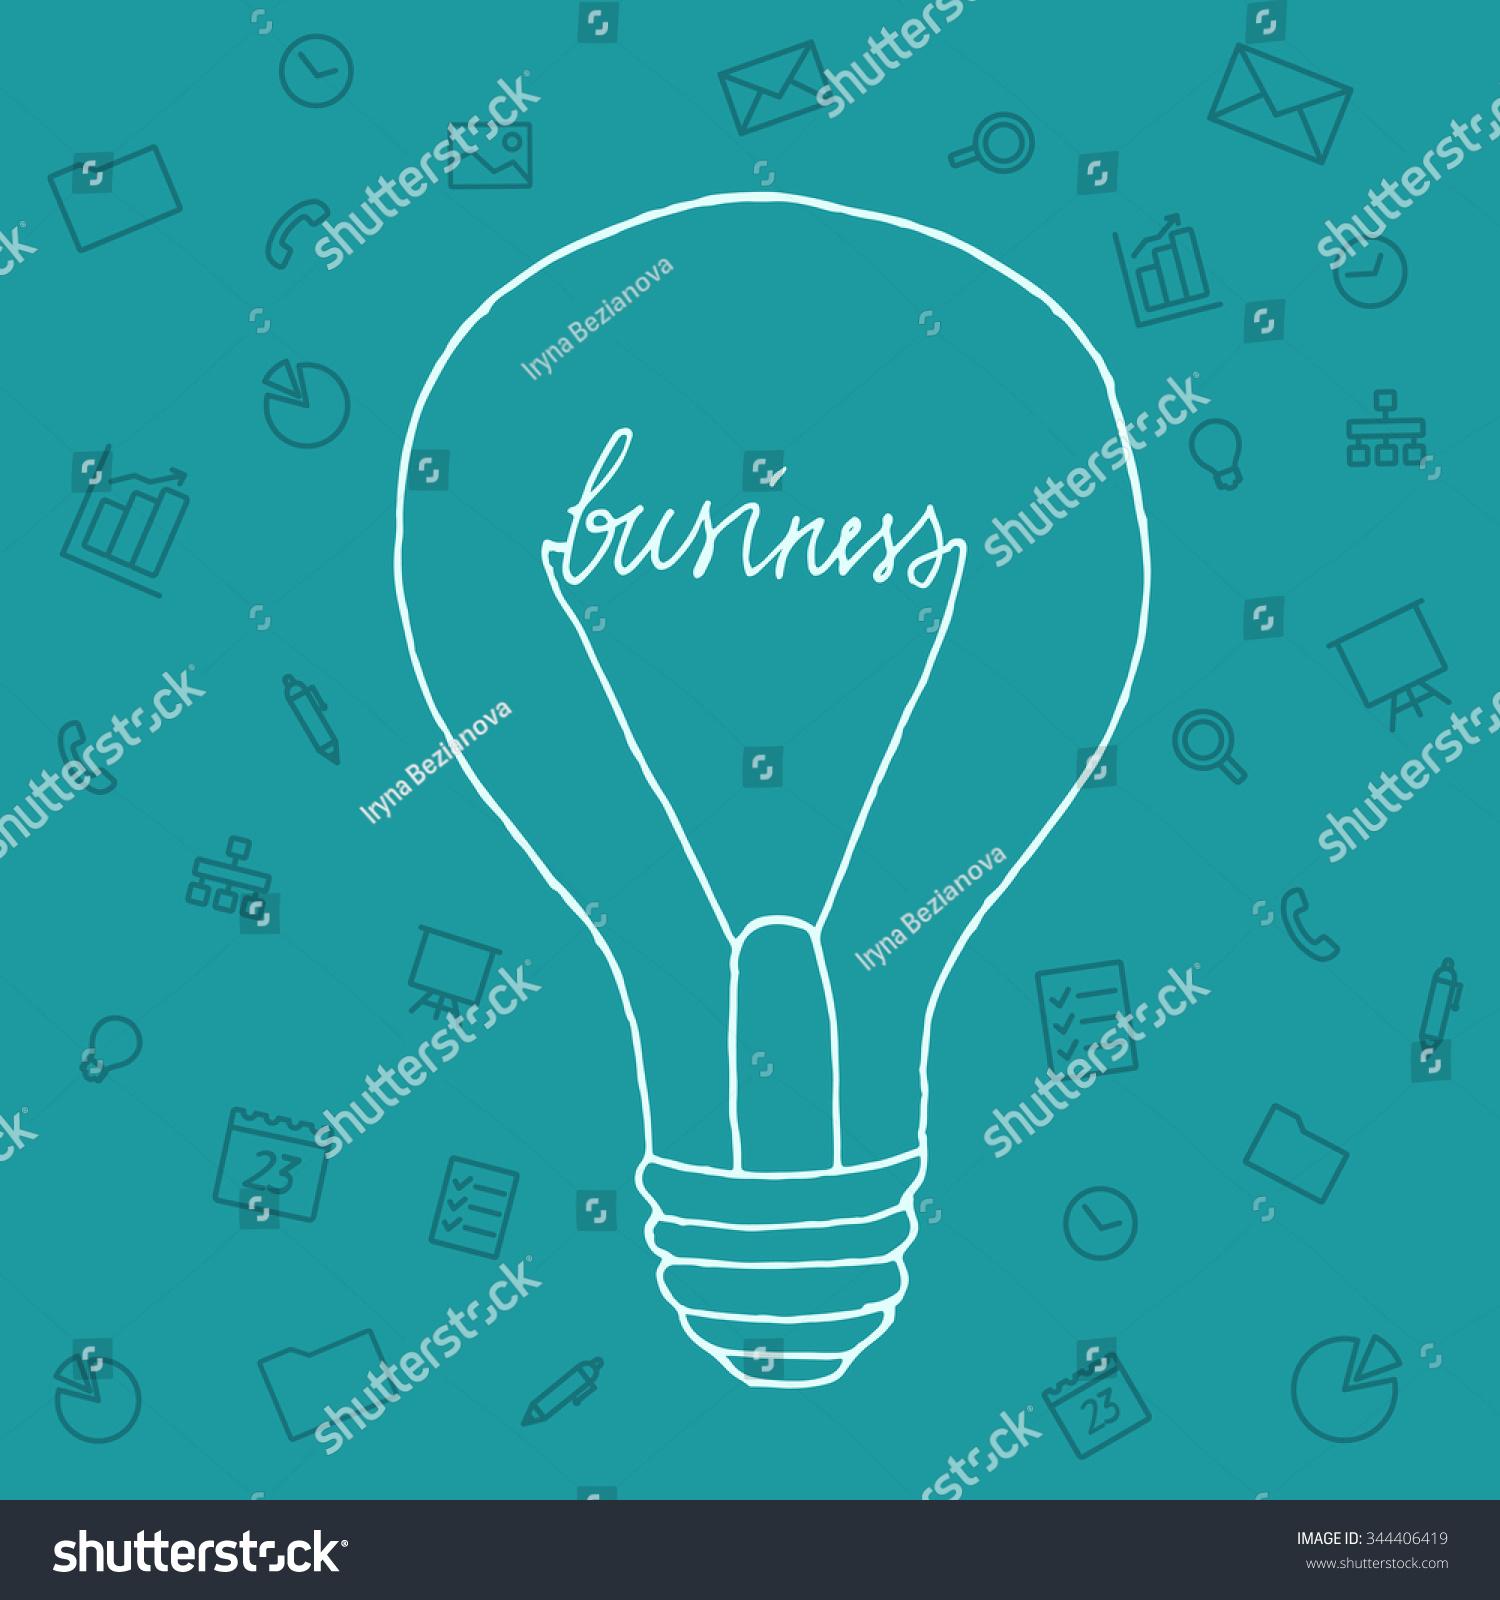 Slide Presentation Ideas Brain Form Light Stock Vector (Royalty Free ...